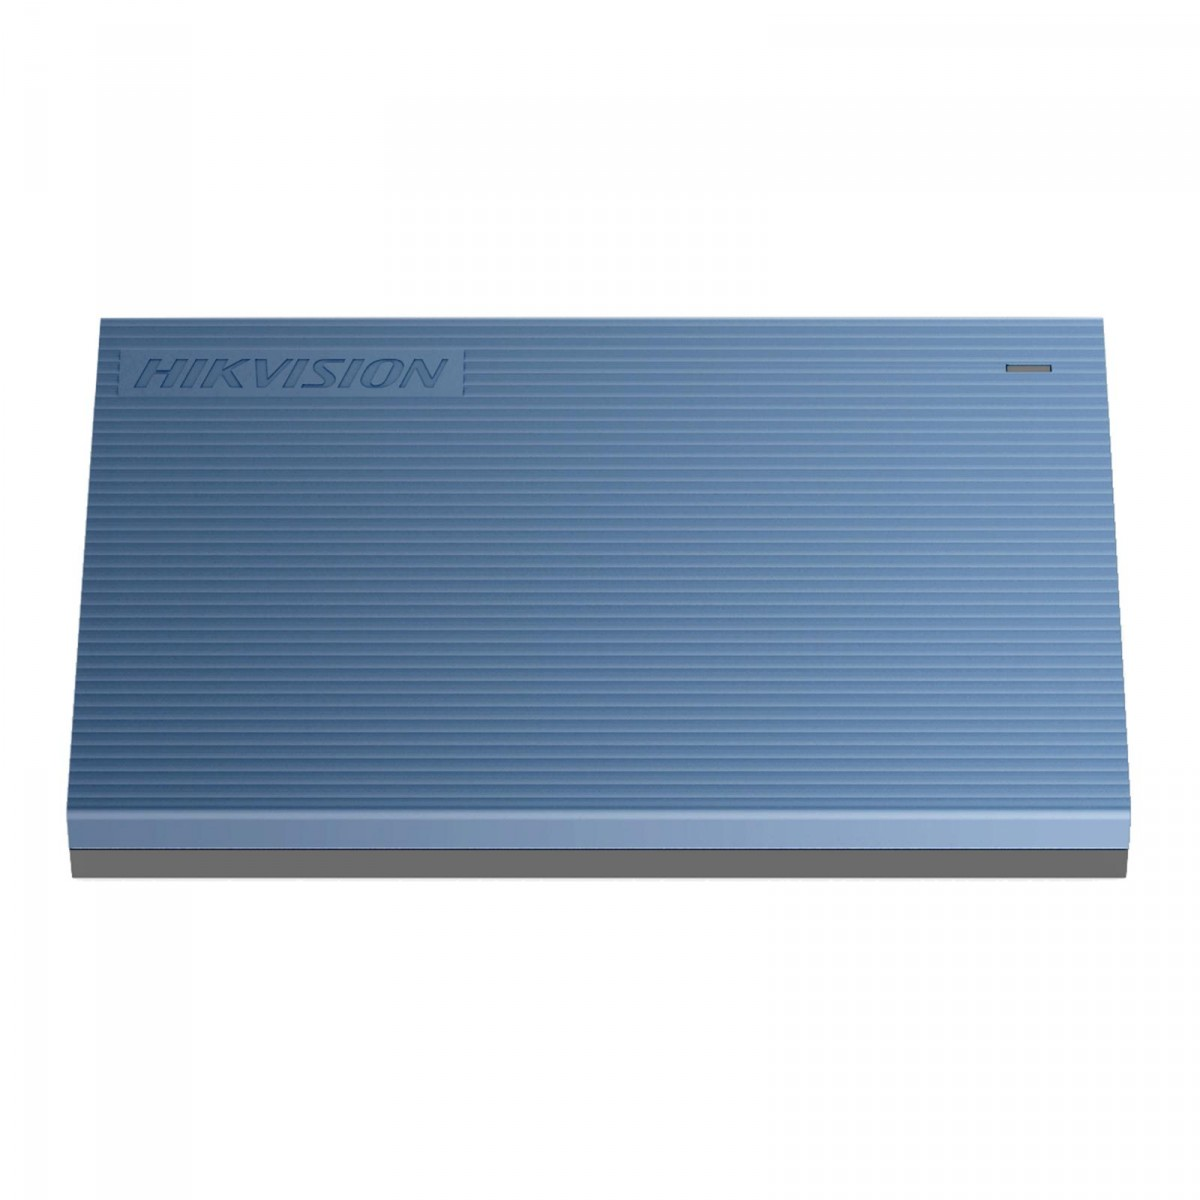 HD Externo Hikvision T30,1TB, USB 3.0, BLUE, HS-EHDD-T30-1T-BLUE